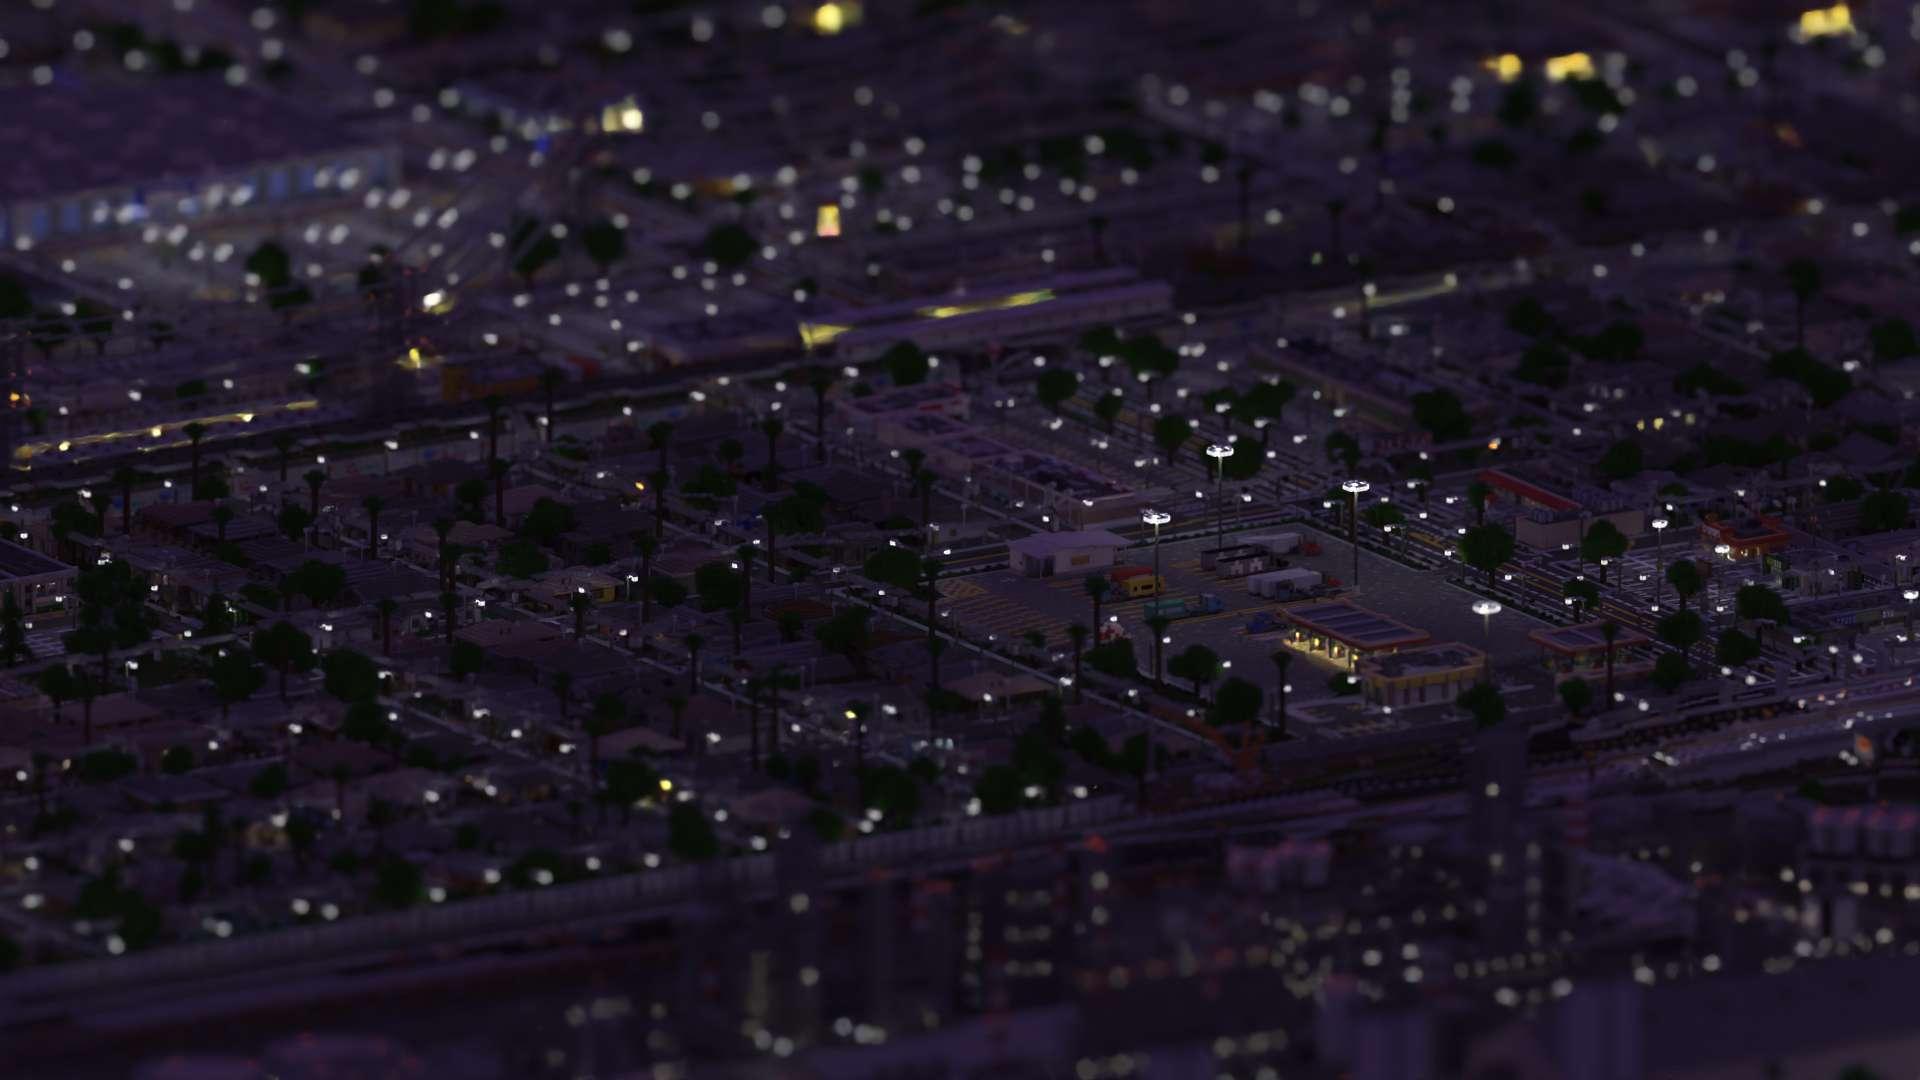 citytiltshift-80.denoised(1).jpg